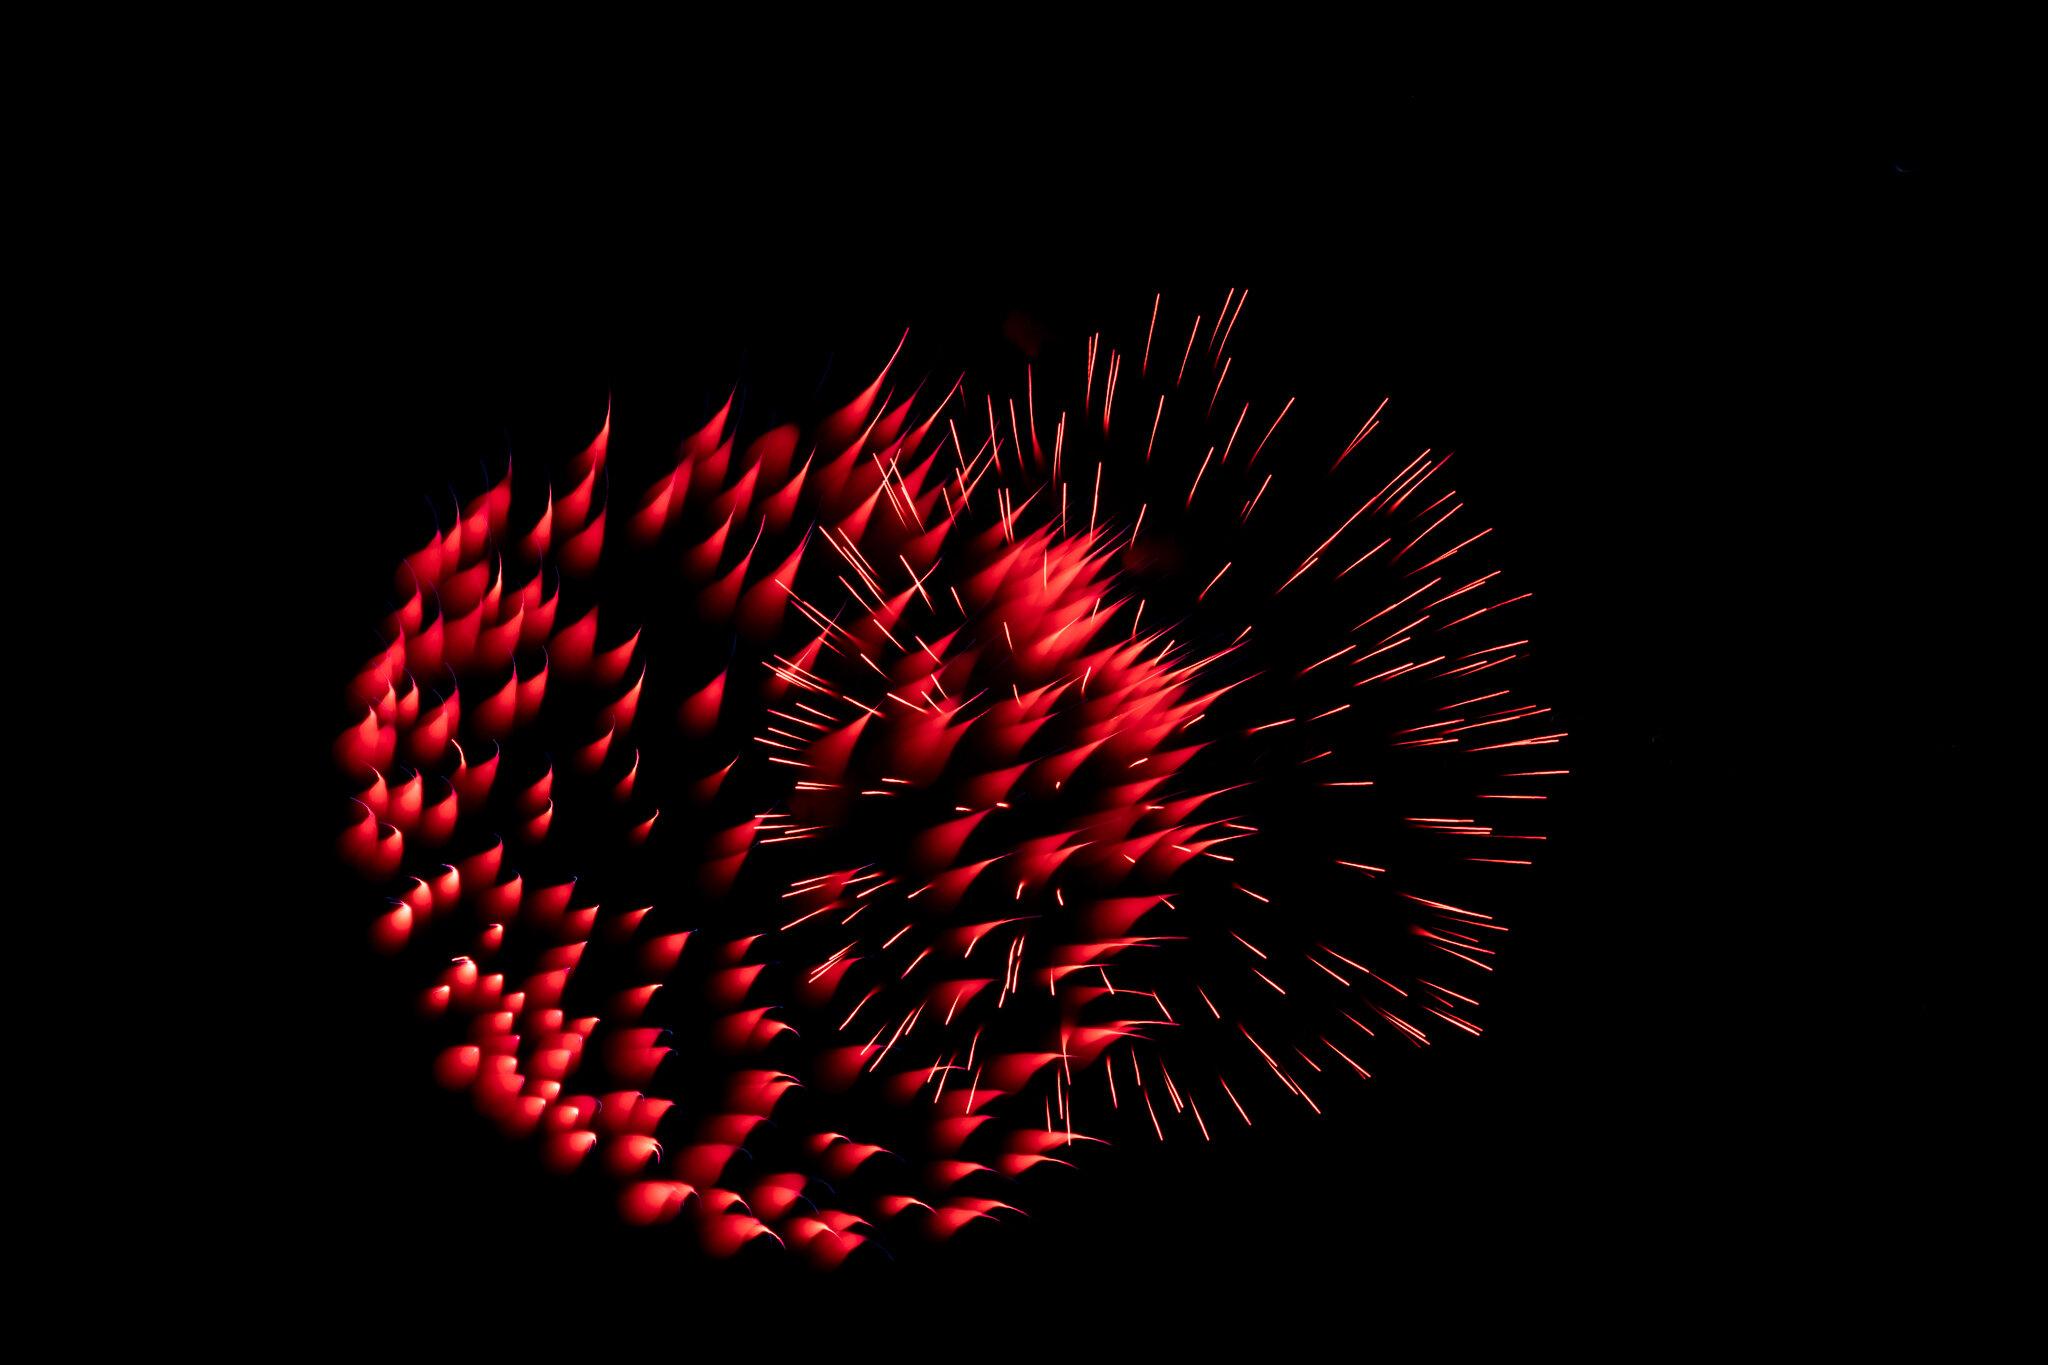 focuspulledfireworks-23.jpg